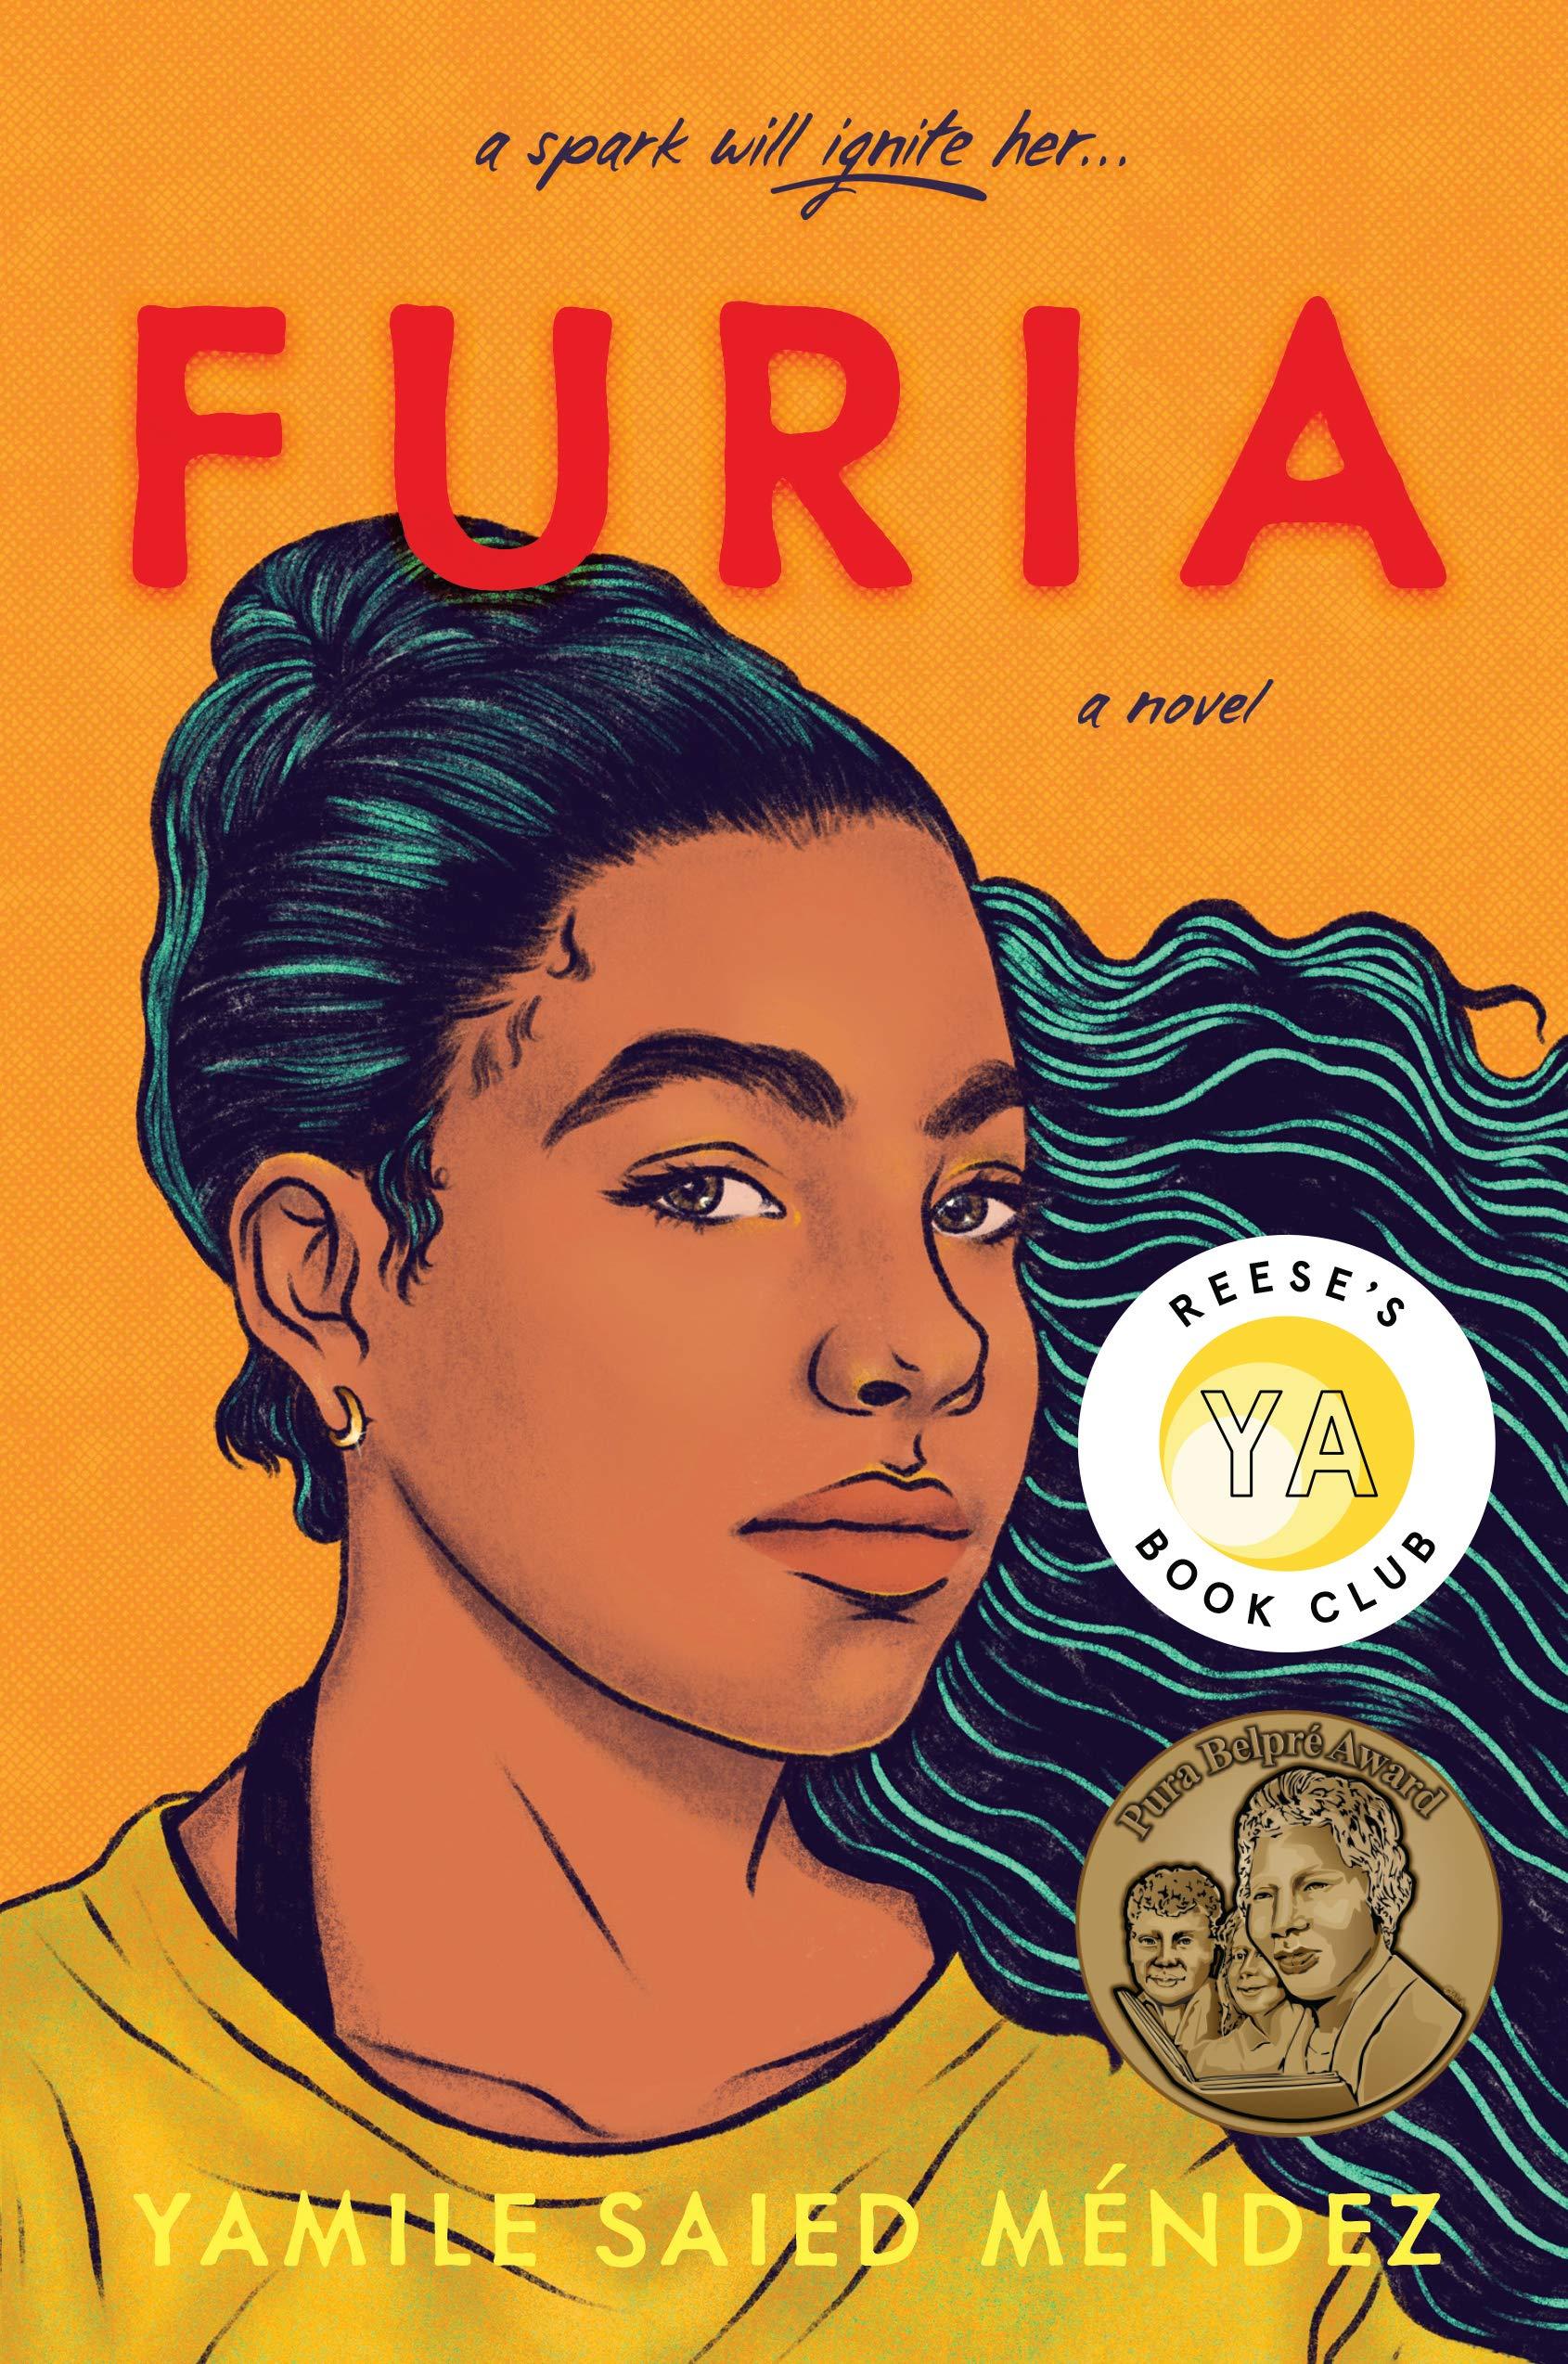 Amazon.com: Furia (9781616209919): Méndez, Yamile Saied: Books